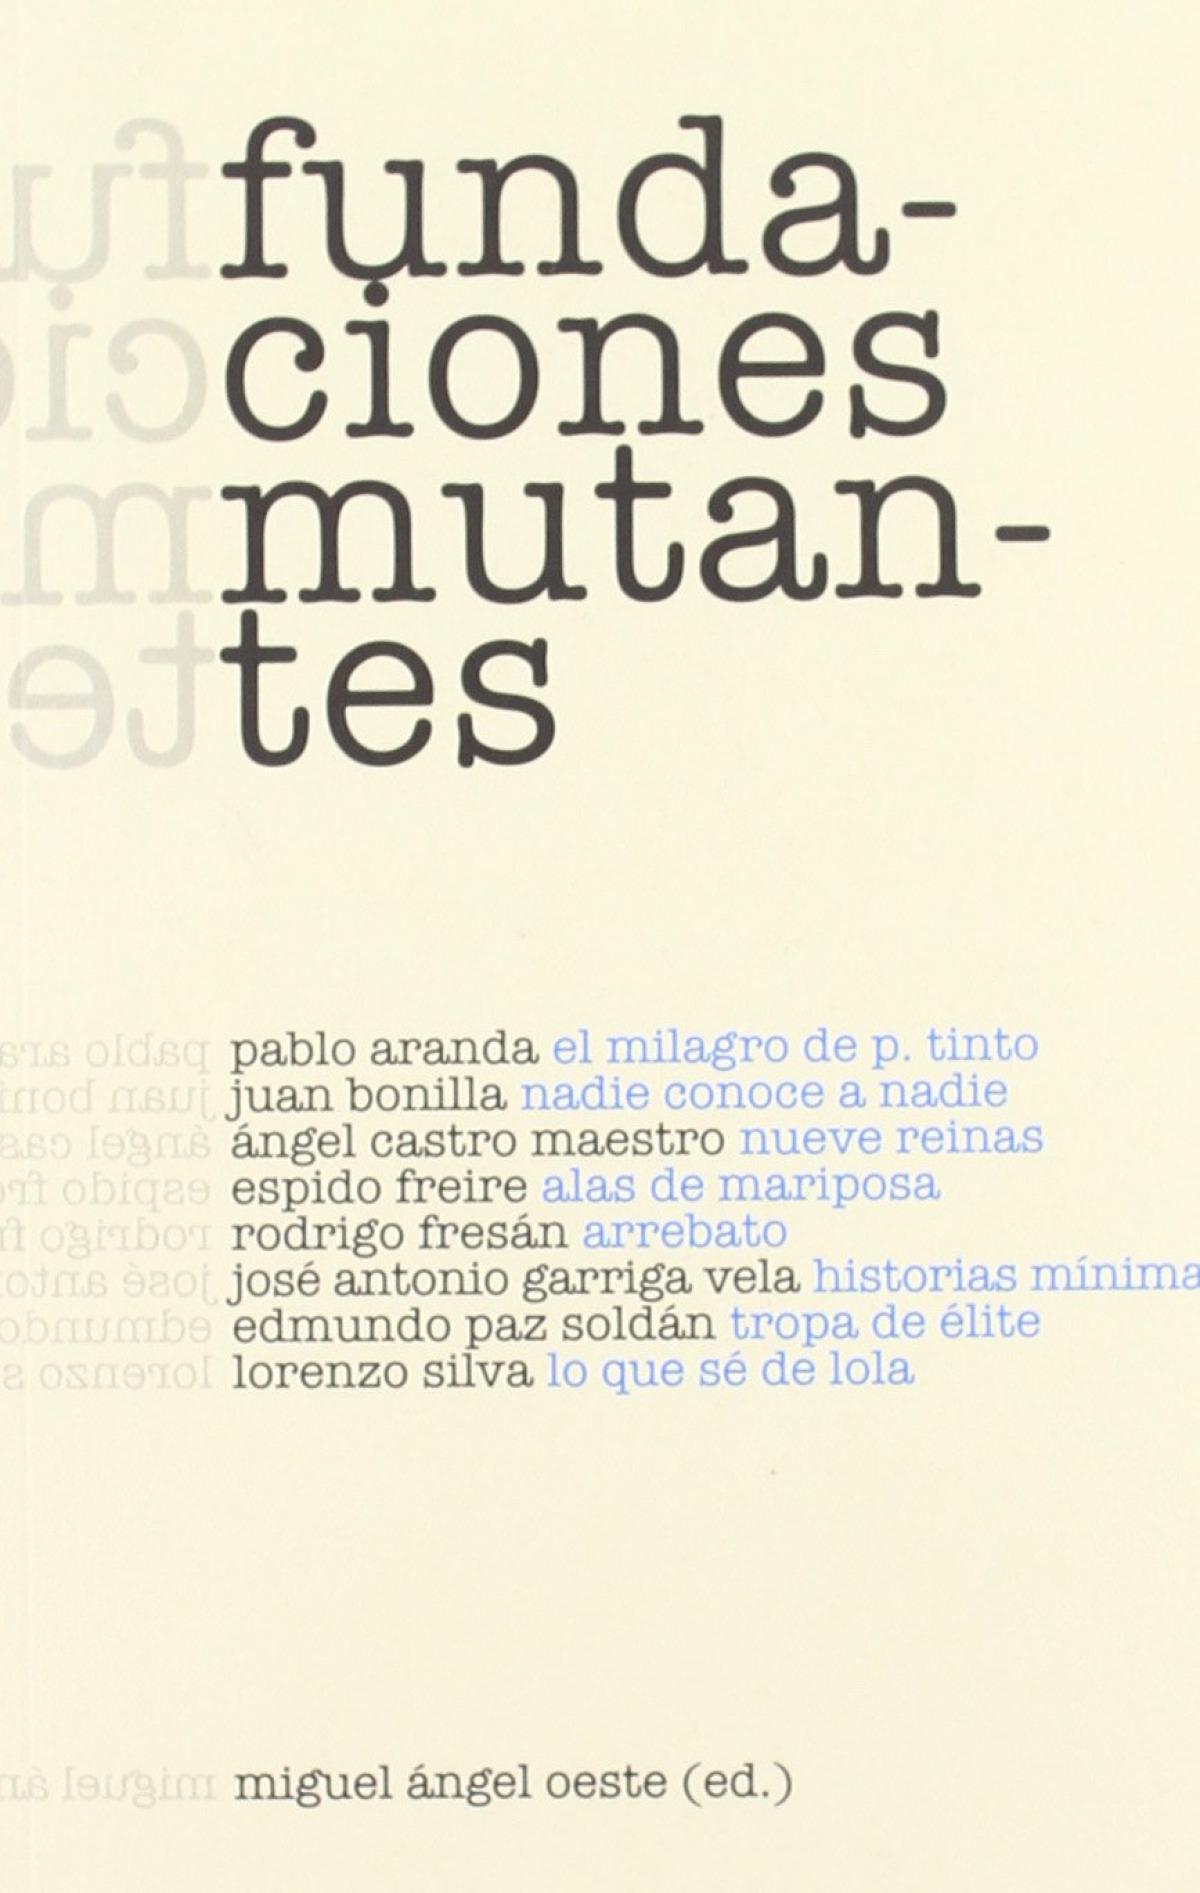 Fundaciones mutantes - Aa.Vv